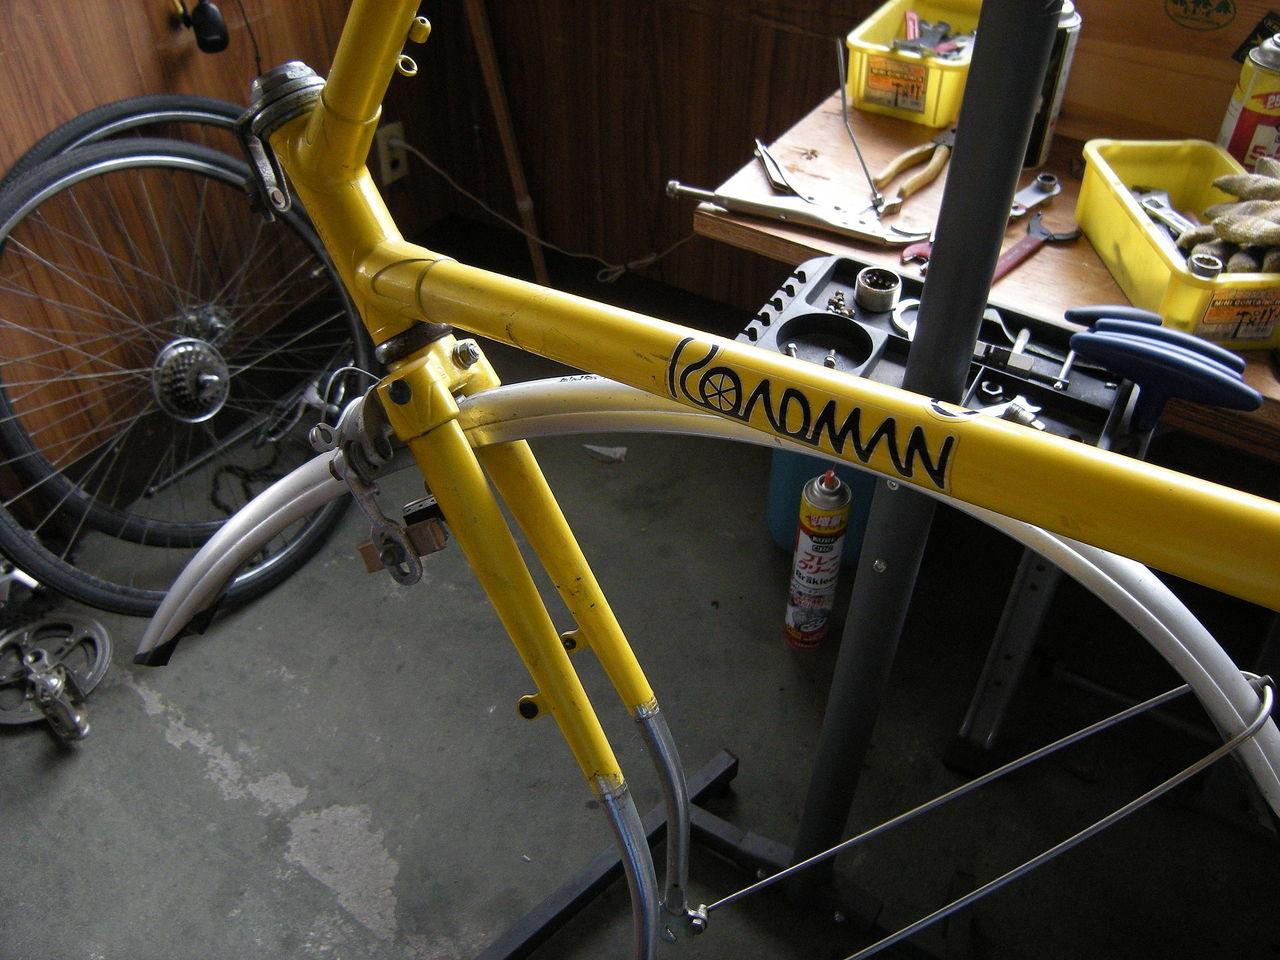 自転車の 自転車 ギヤ 交換 : 評価 -- 1(最低) 2 3 4 5(最高 ...